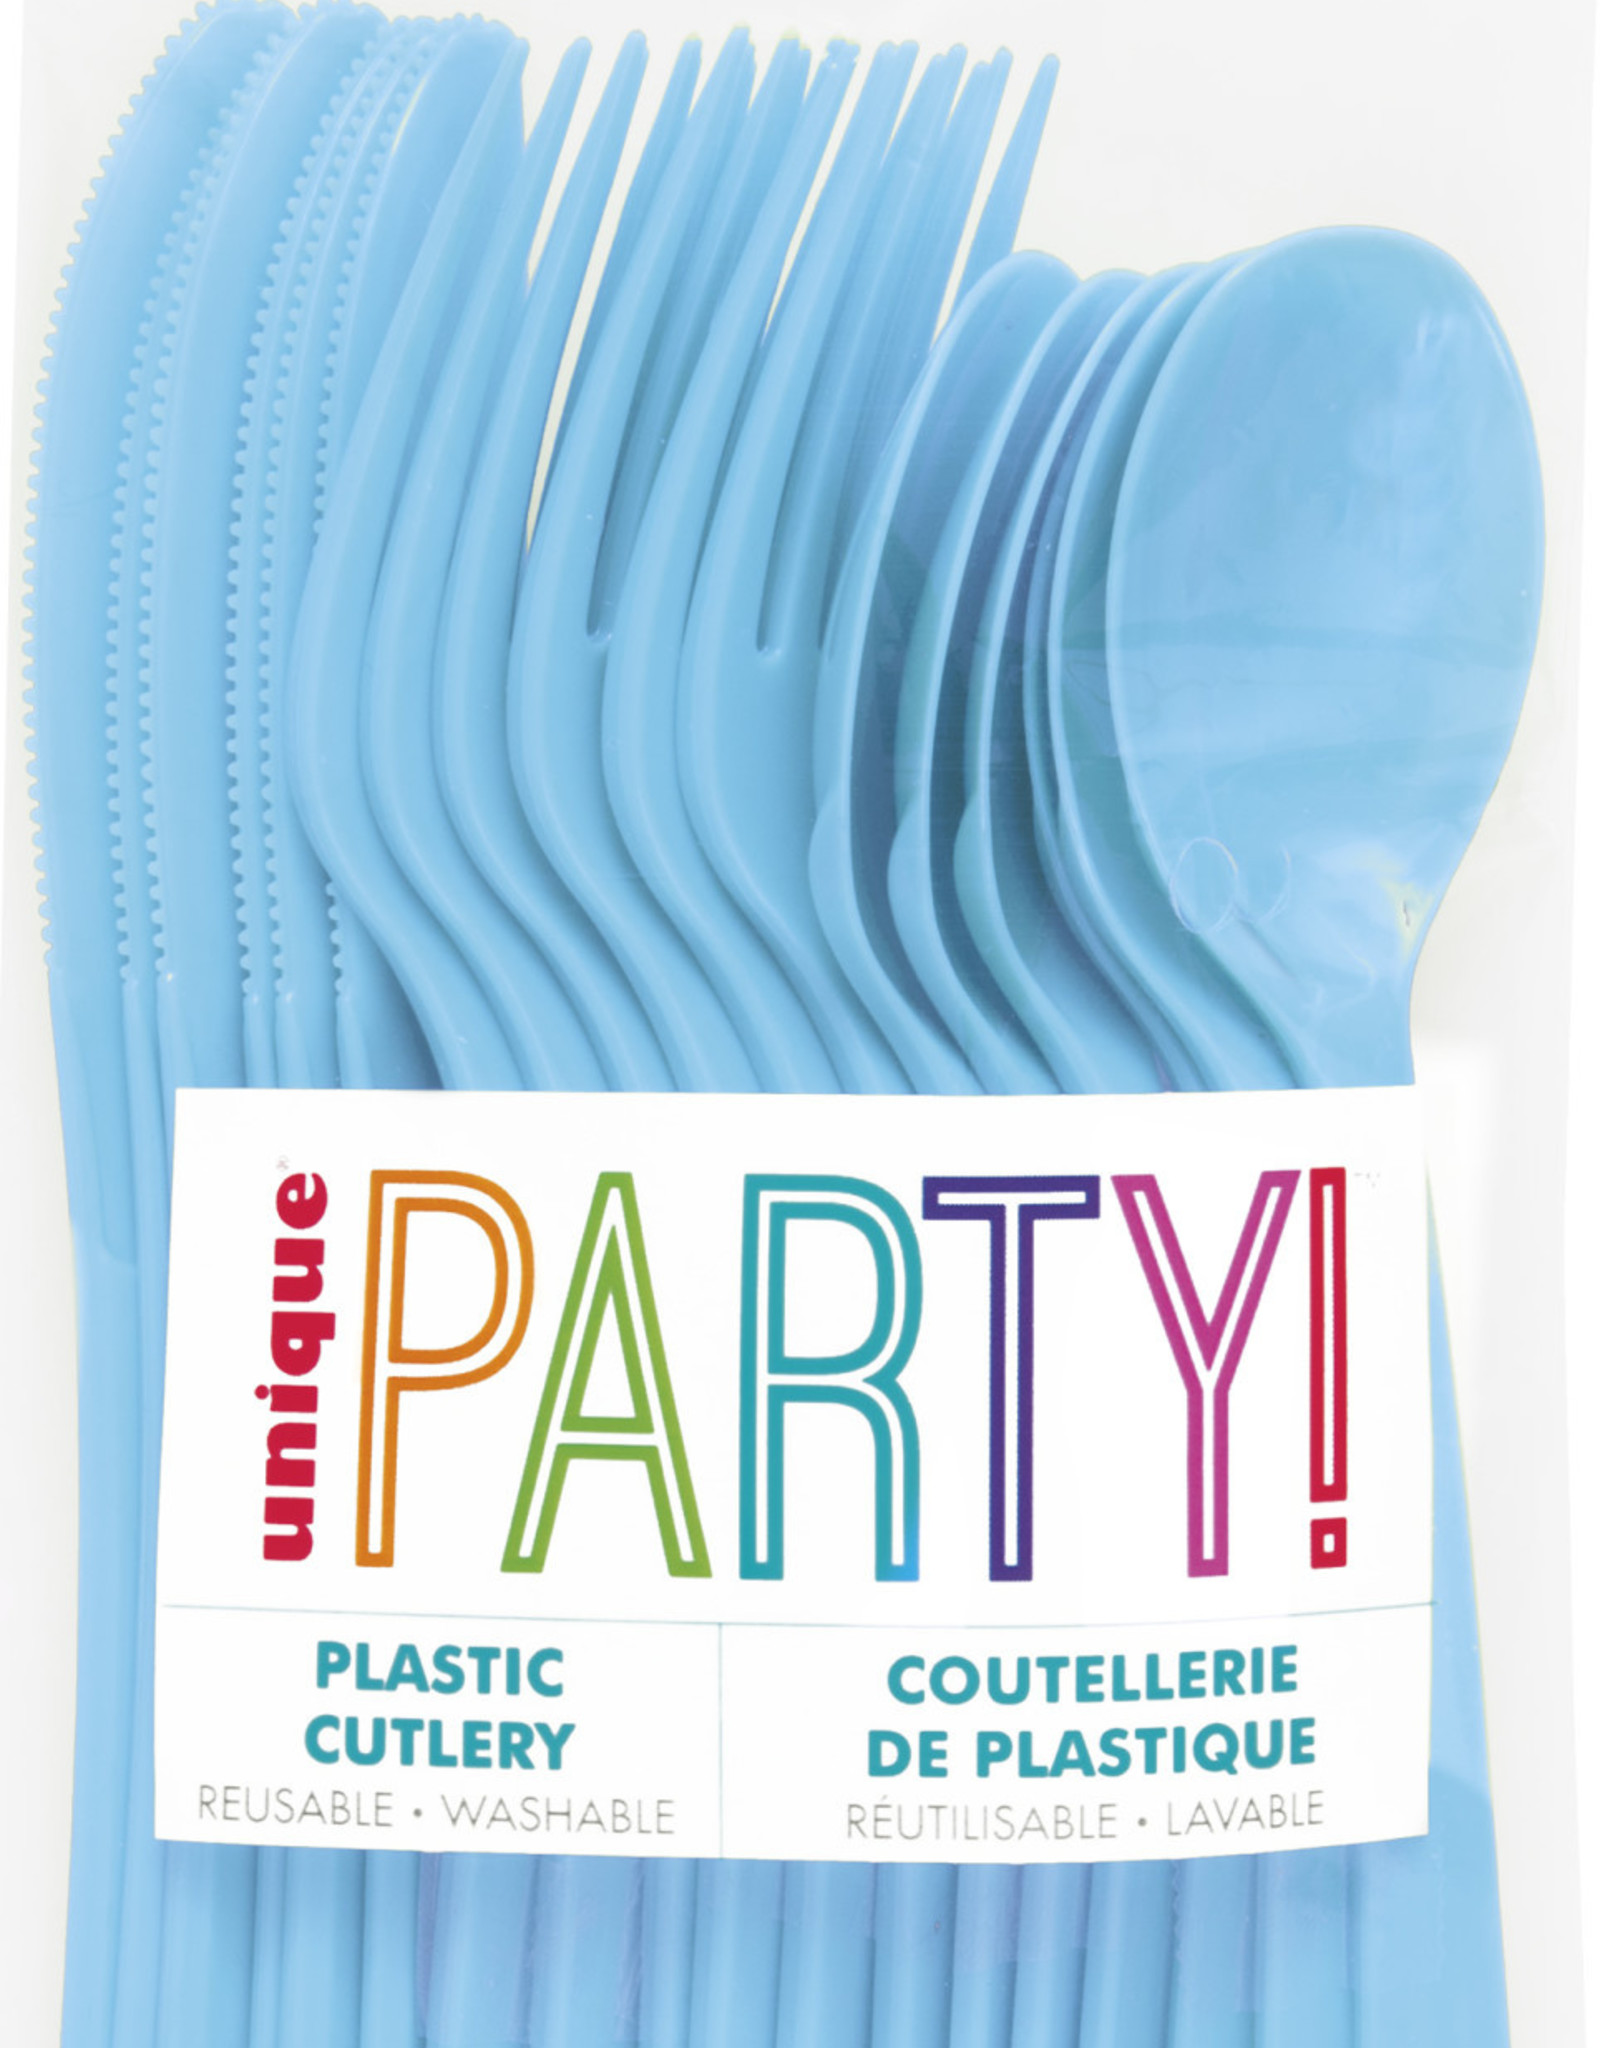 Powder Blue Solid Assorted Plastic Cutlery 18ct